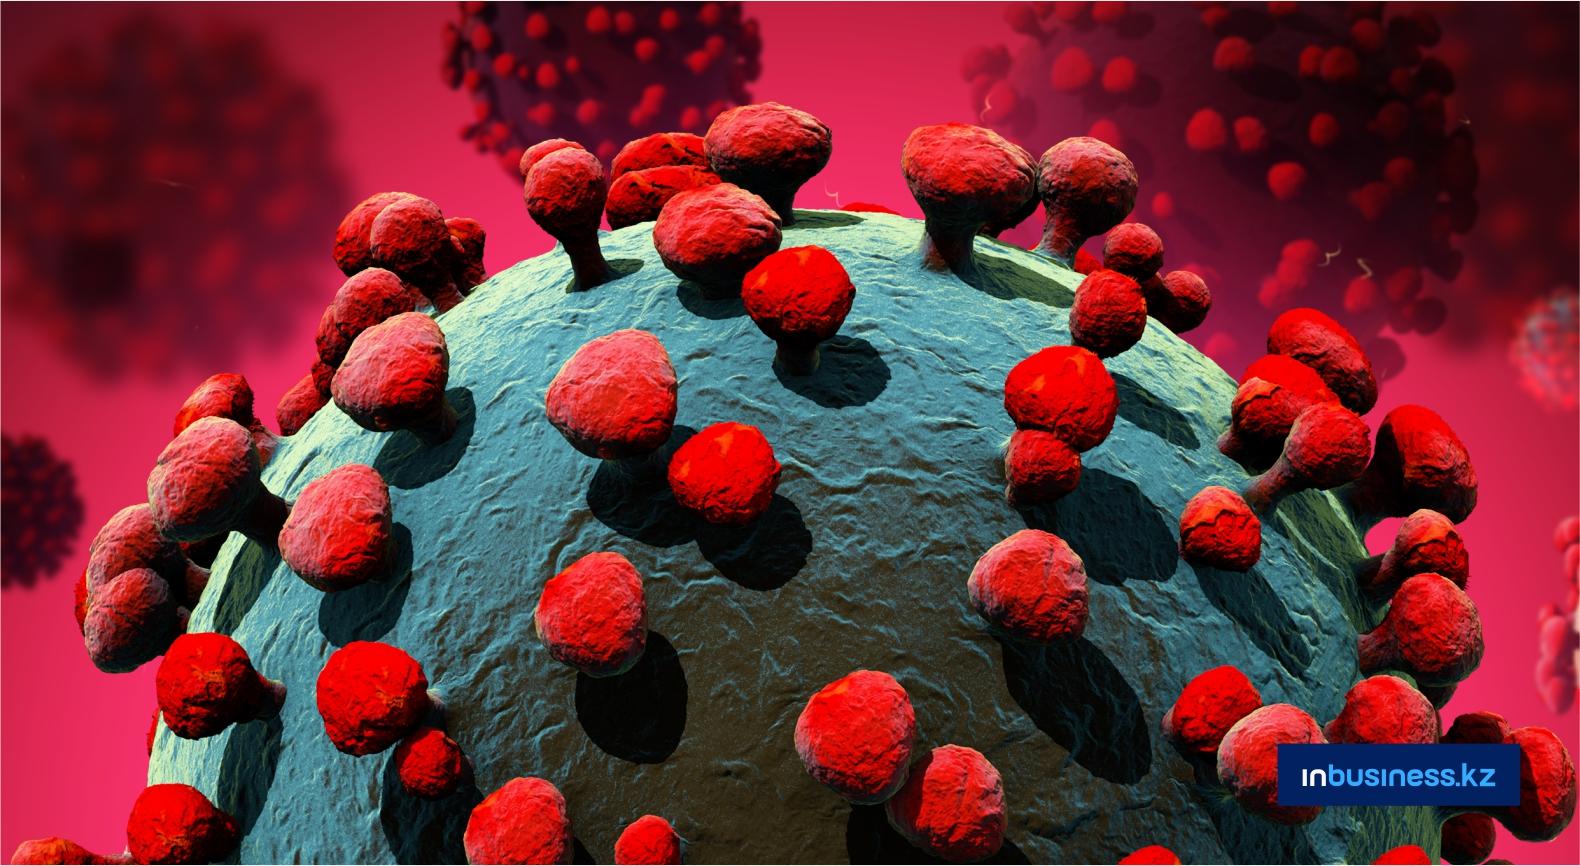 107 казахстанцев заболели коронавирусом за сутки